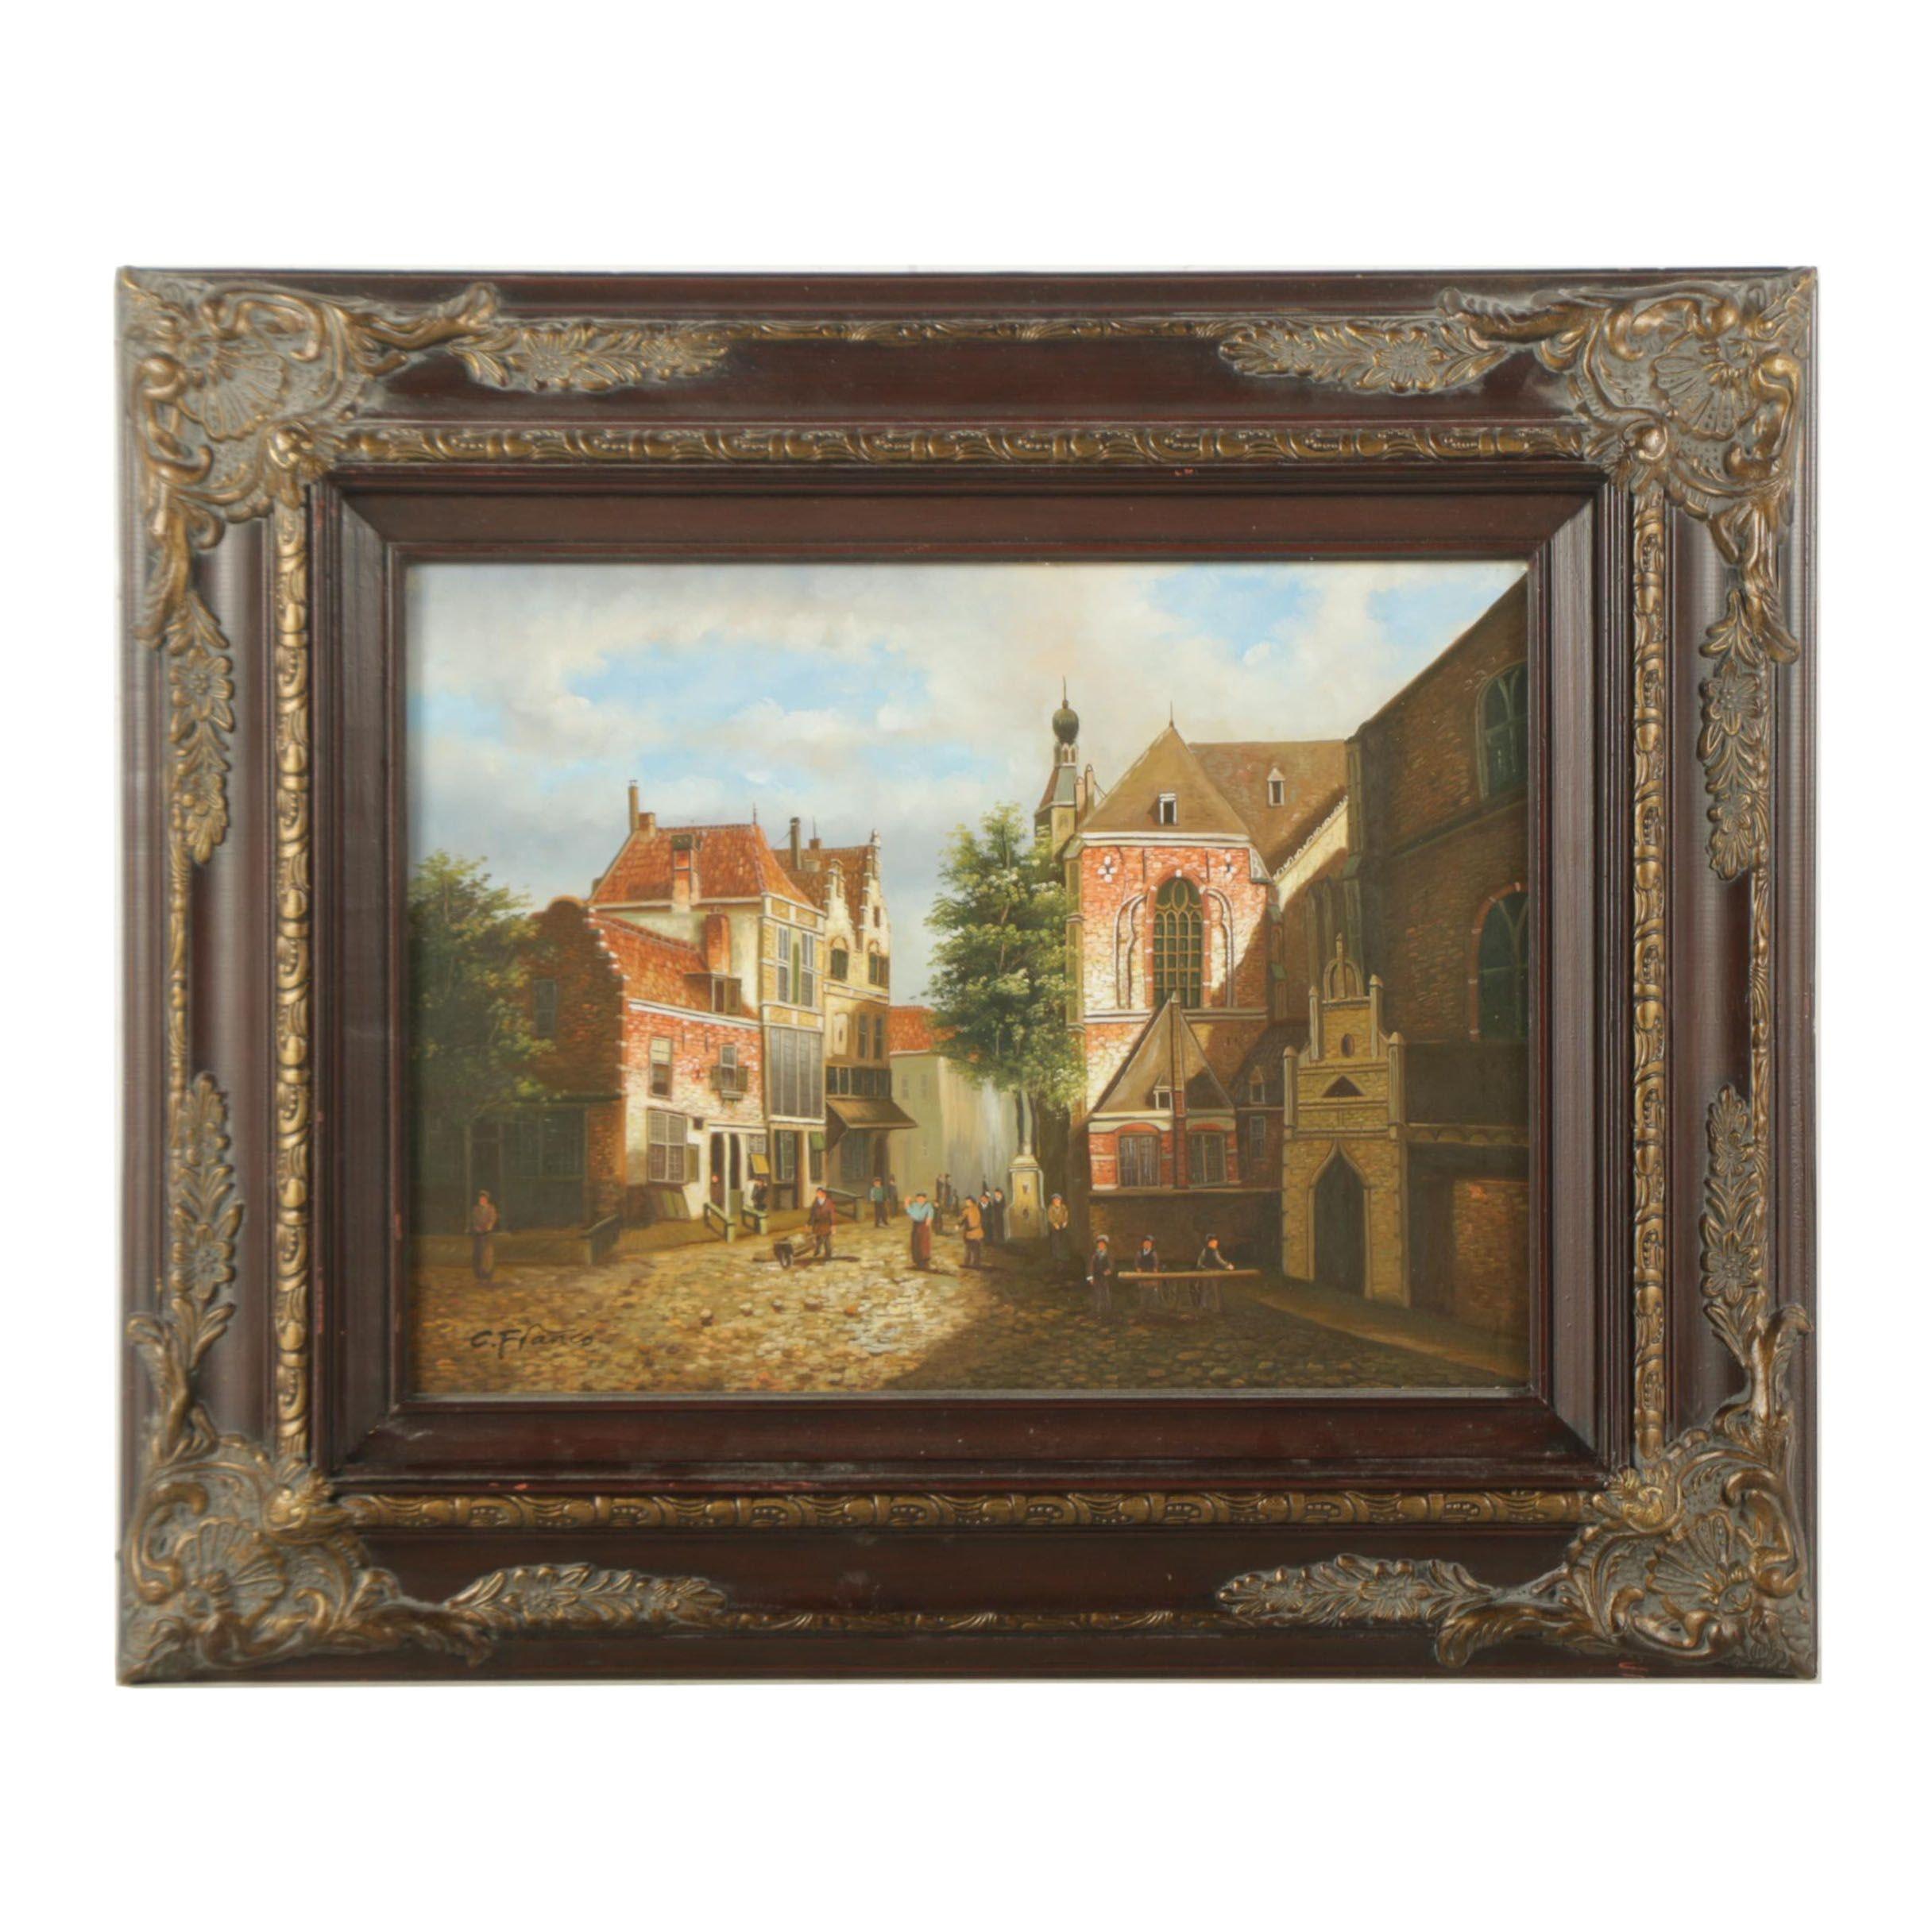 C. Franco Oil Painting on Panel of European Village Scene